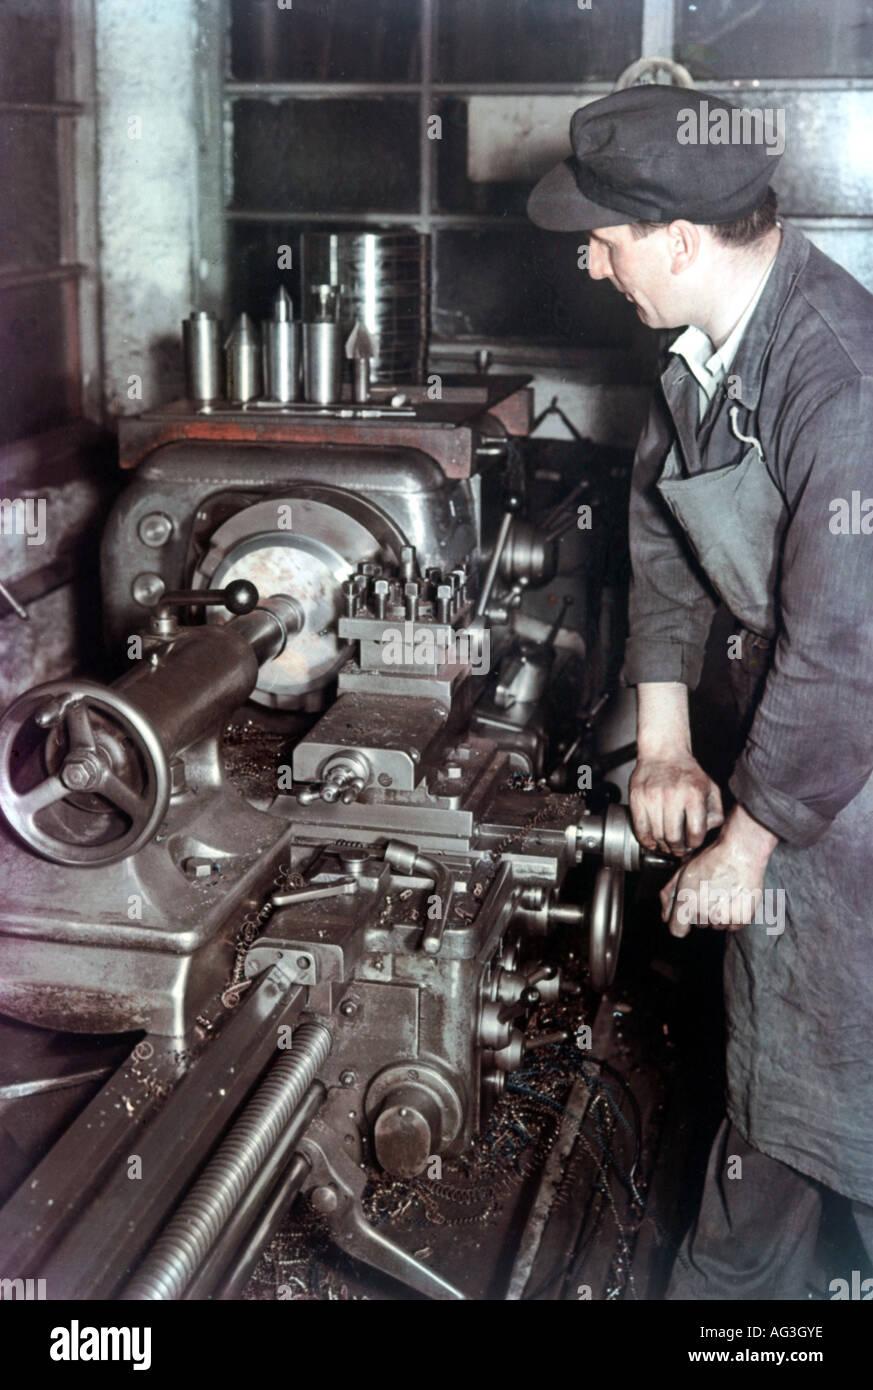 lathe machine operator